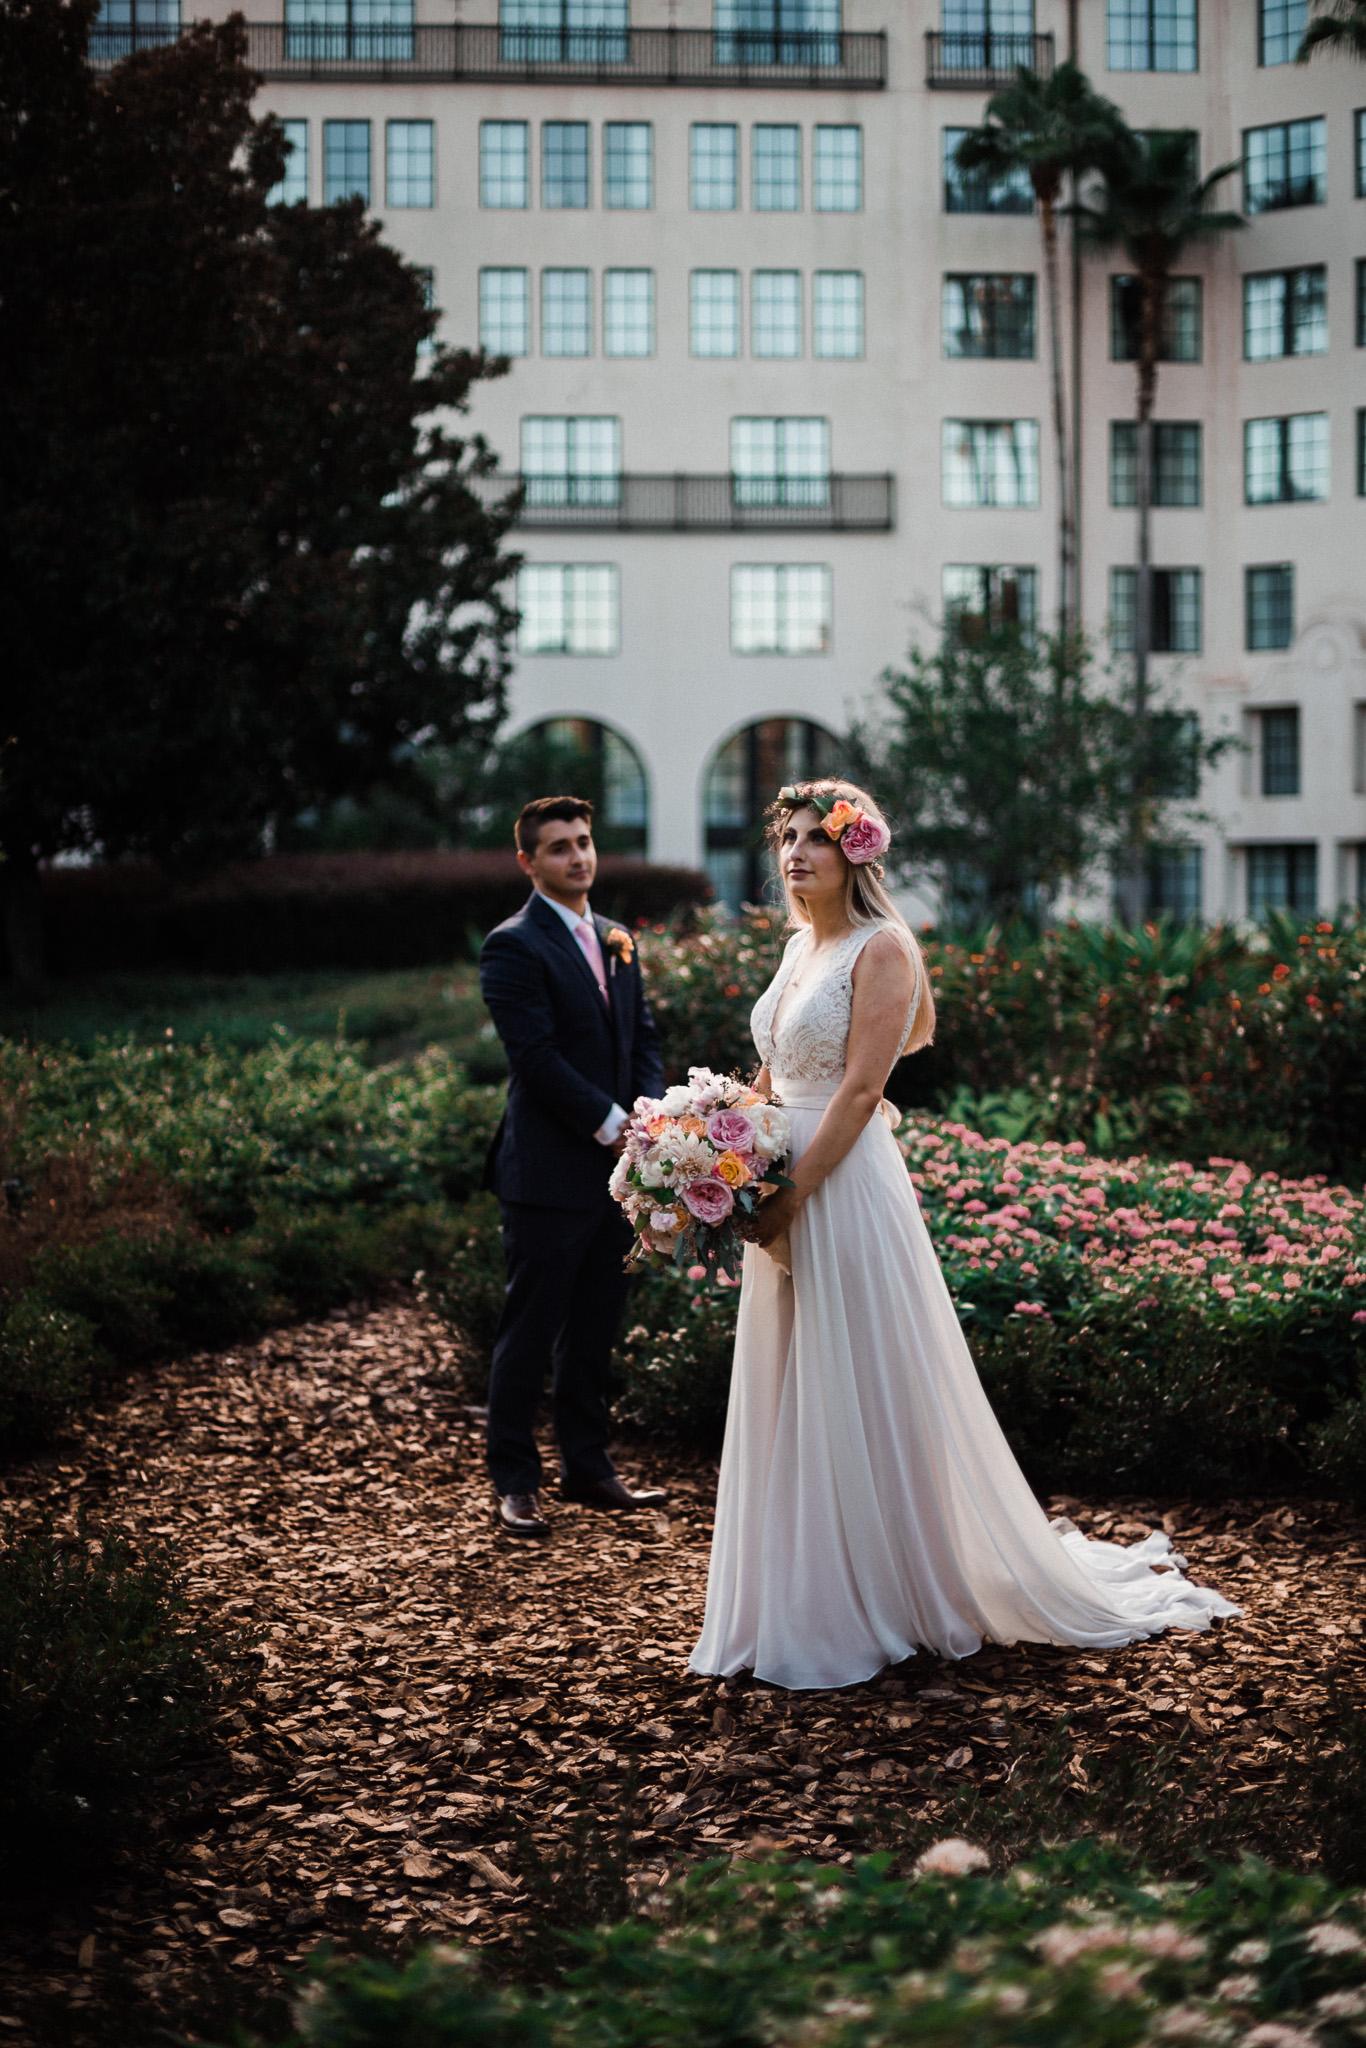 20180817_JerrySamantha_Wedding_RJ-48.jpg